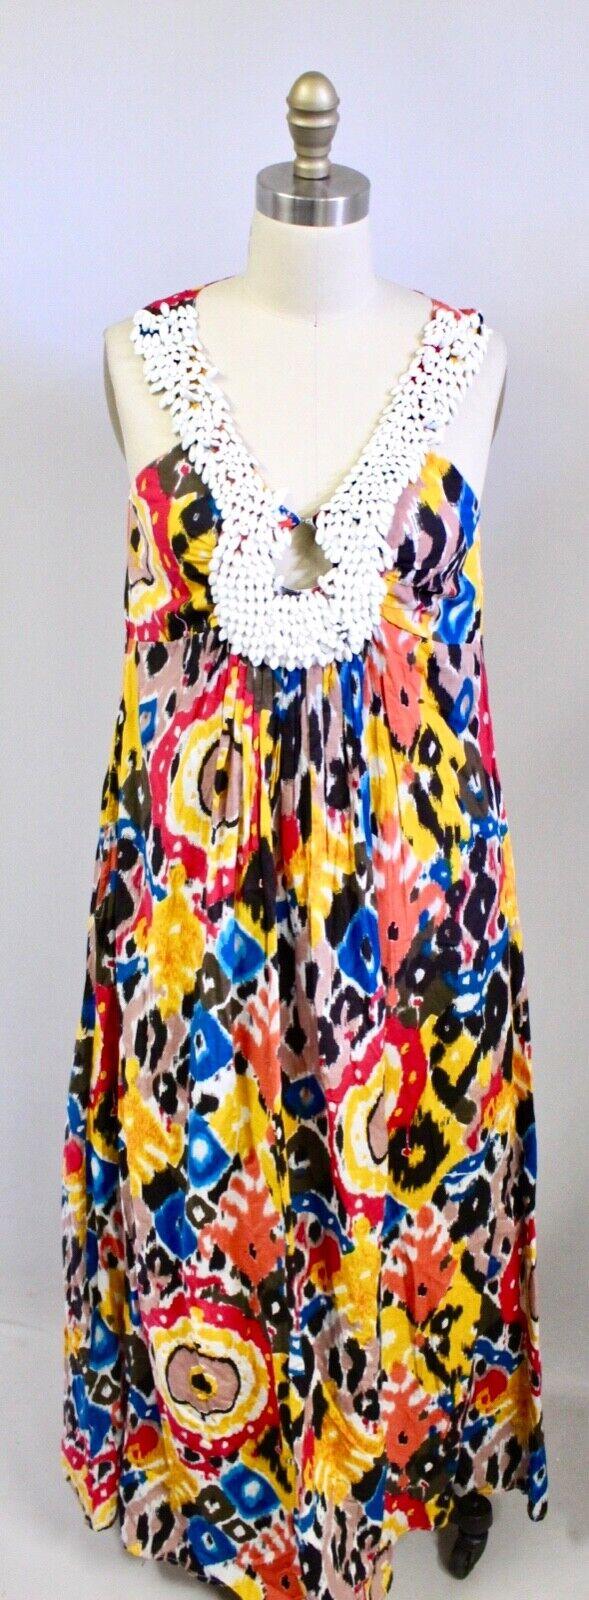 KAS New York Woherren S Heavy Beaded Neck Brightly ColGoldt Boho Long Dress NWOT